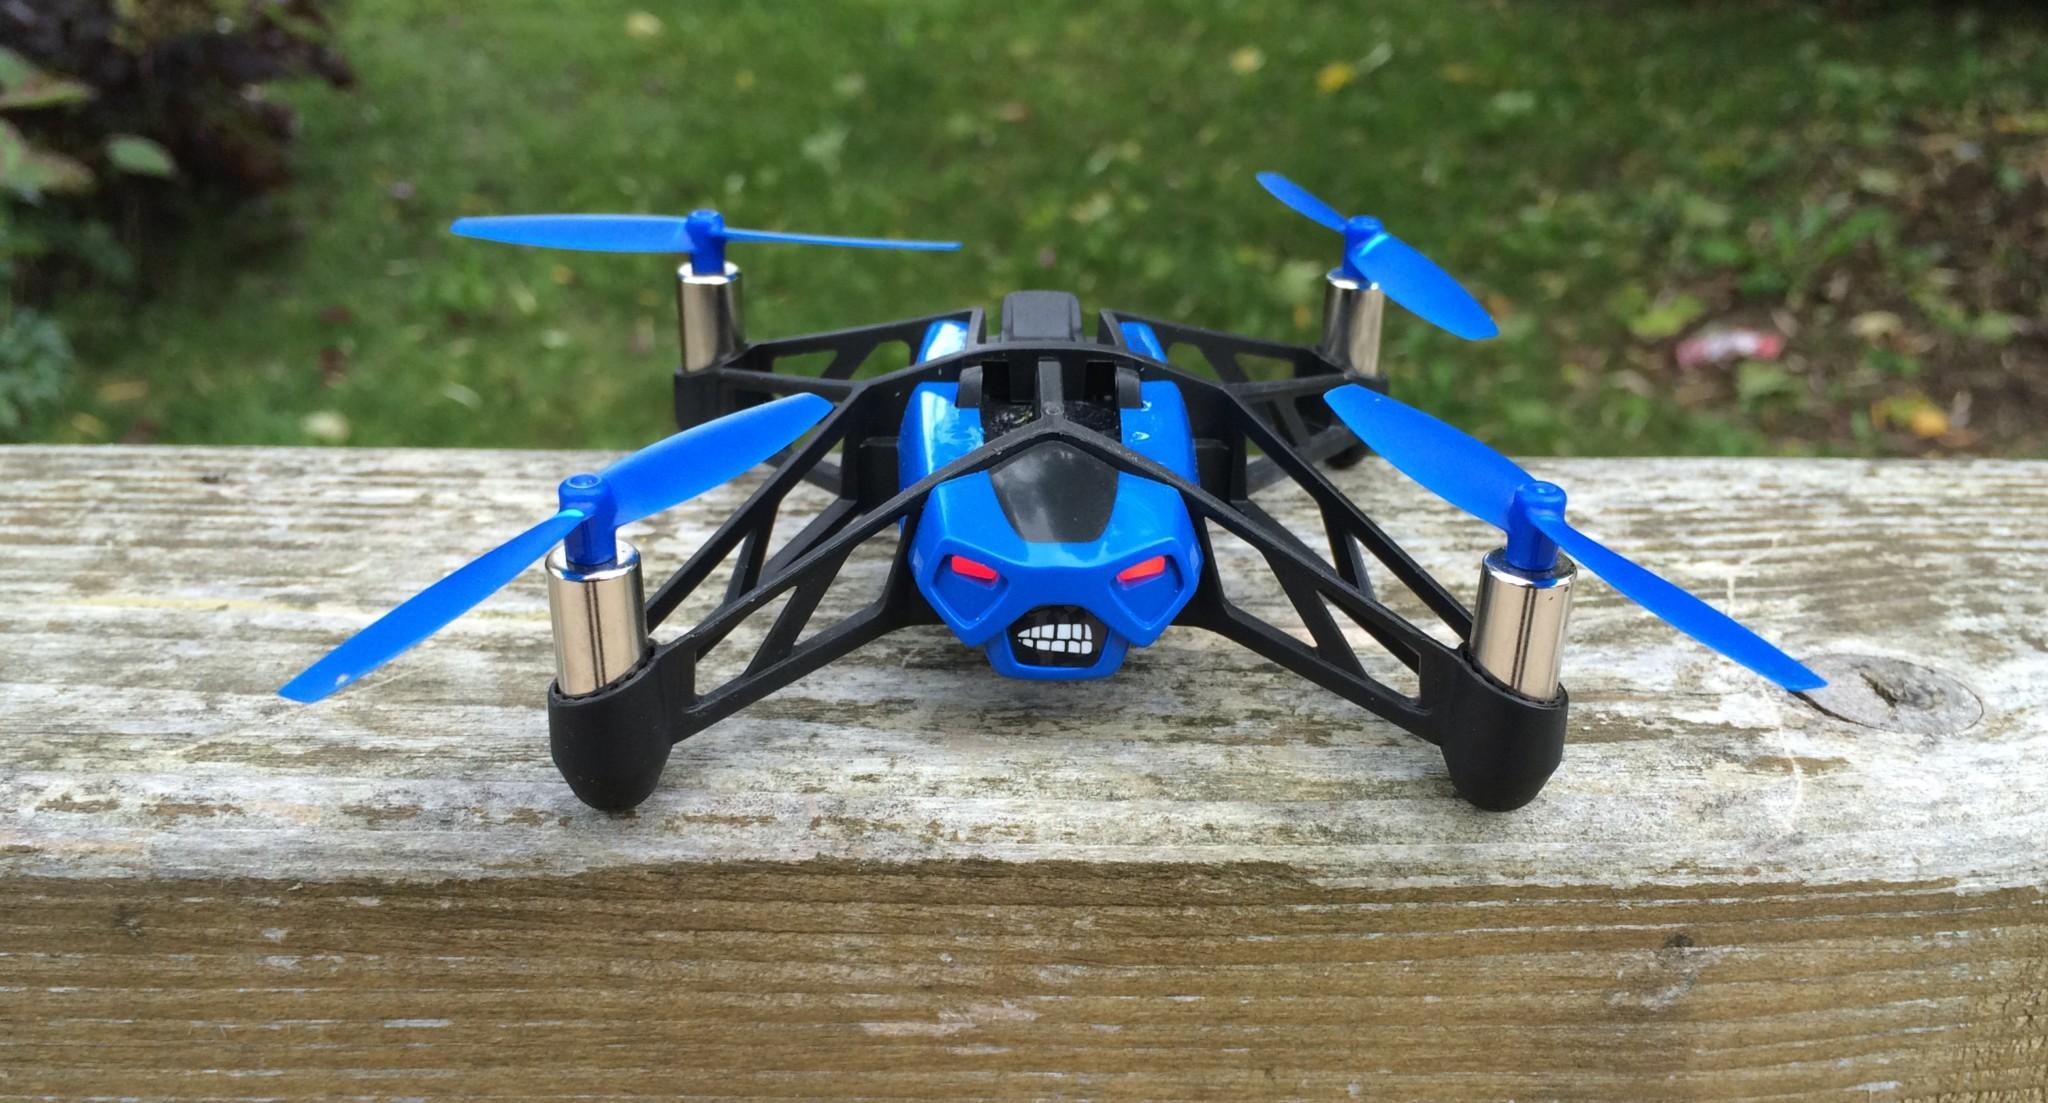 Parrot Rolling Spider – malý, ale rychlý dron [recenze]